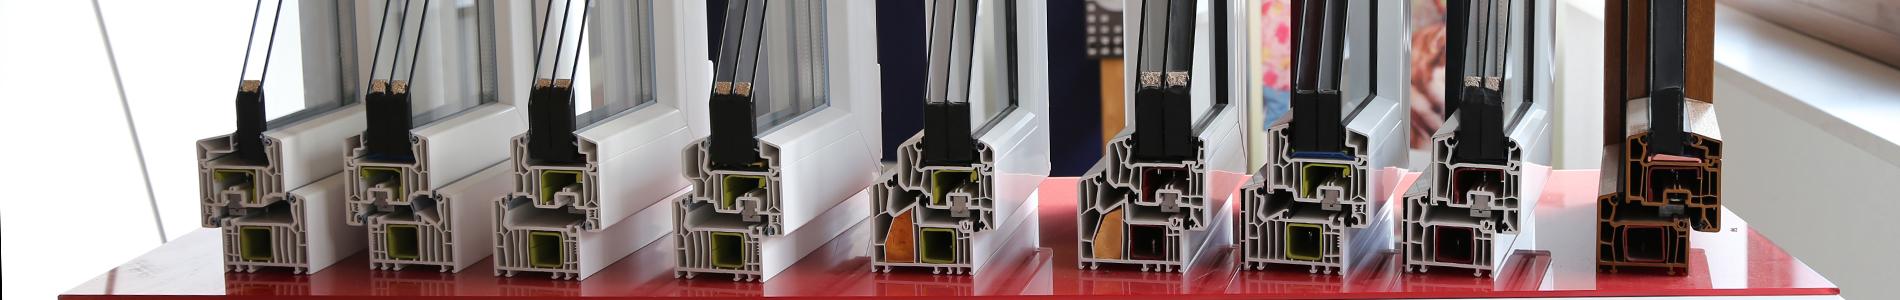 Fensterbau heubach kunststoff und kunststoff alu fenster for Kunststoff alu fenster